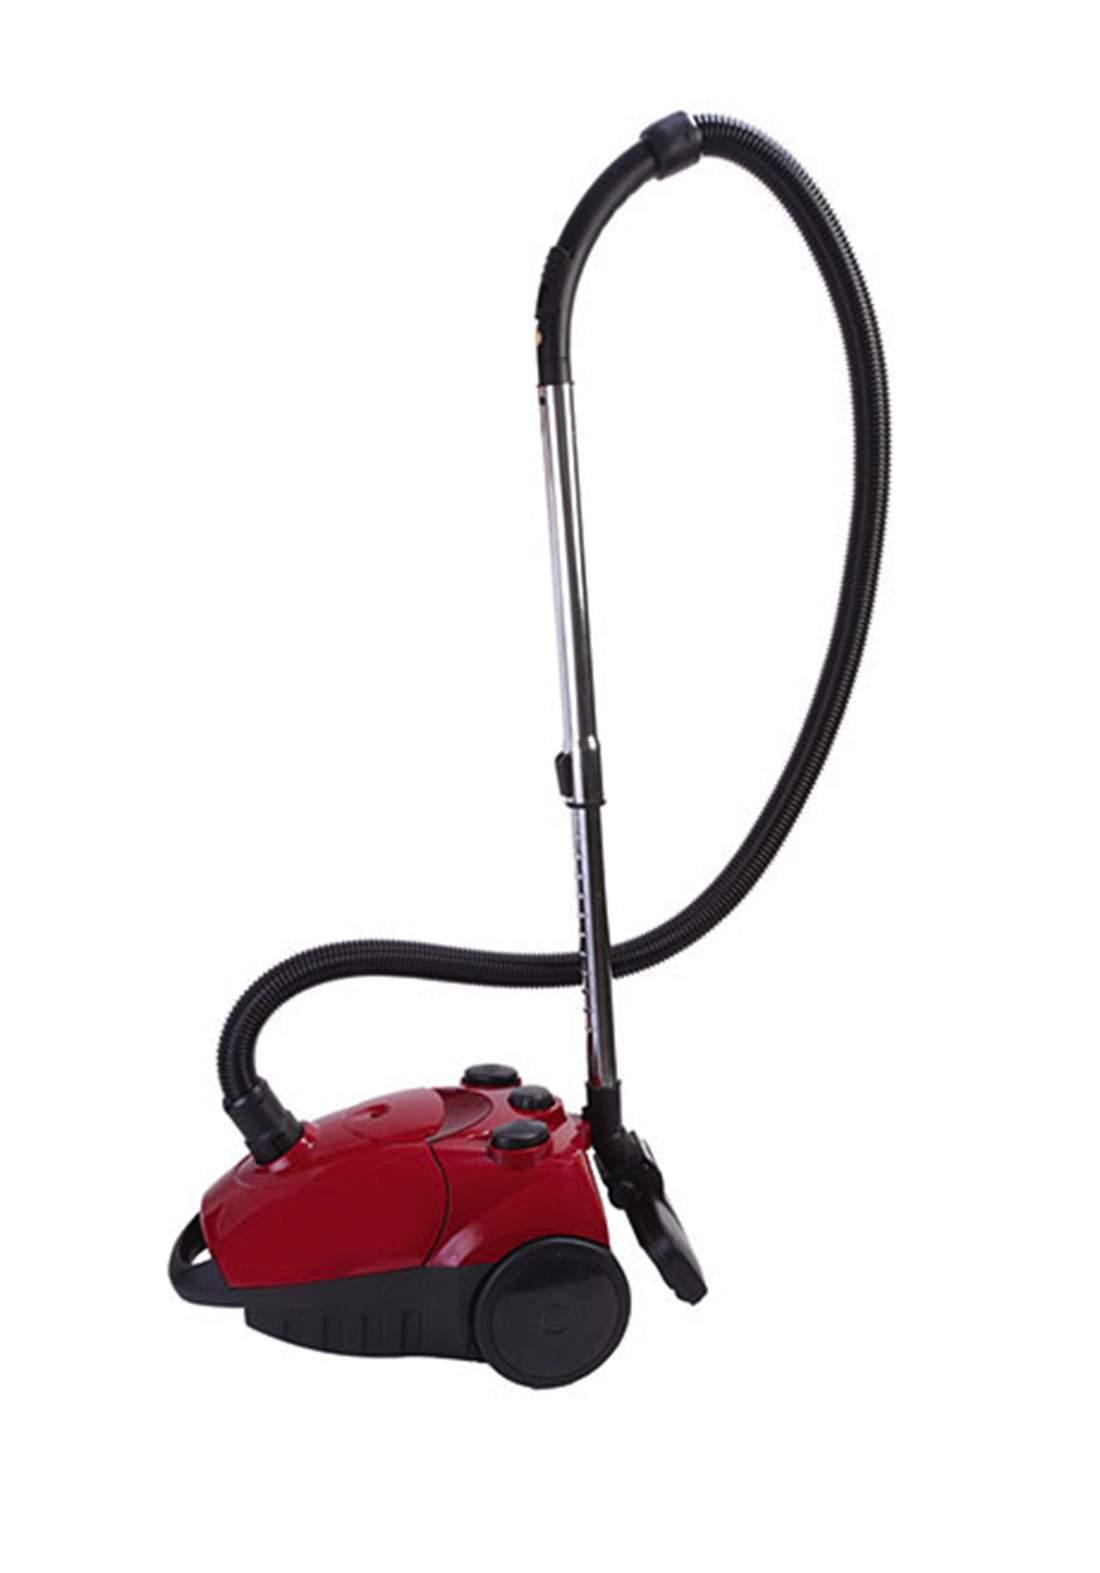 Shownic VC-03E16RR Vacuum Cleaner مكنسة كهربائية